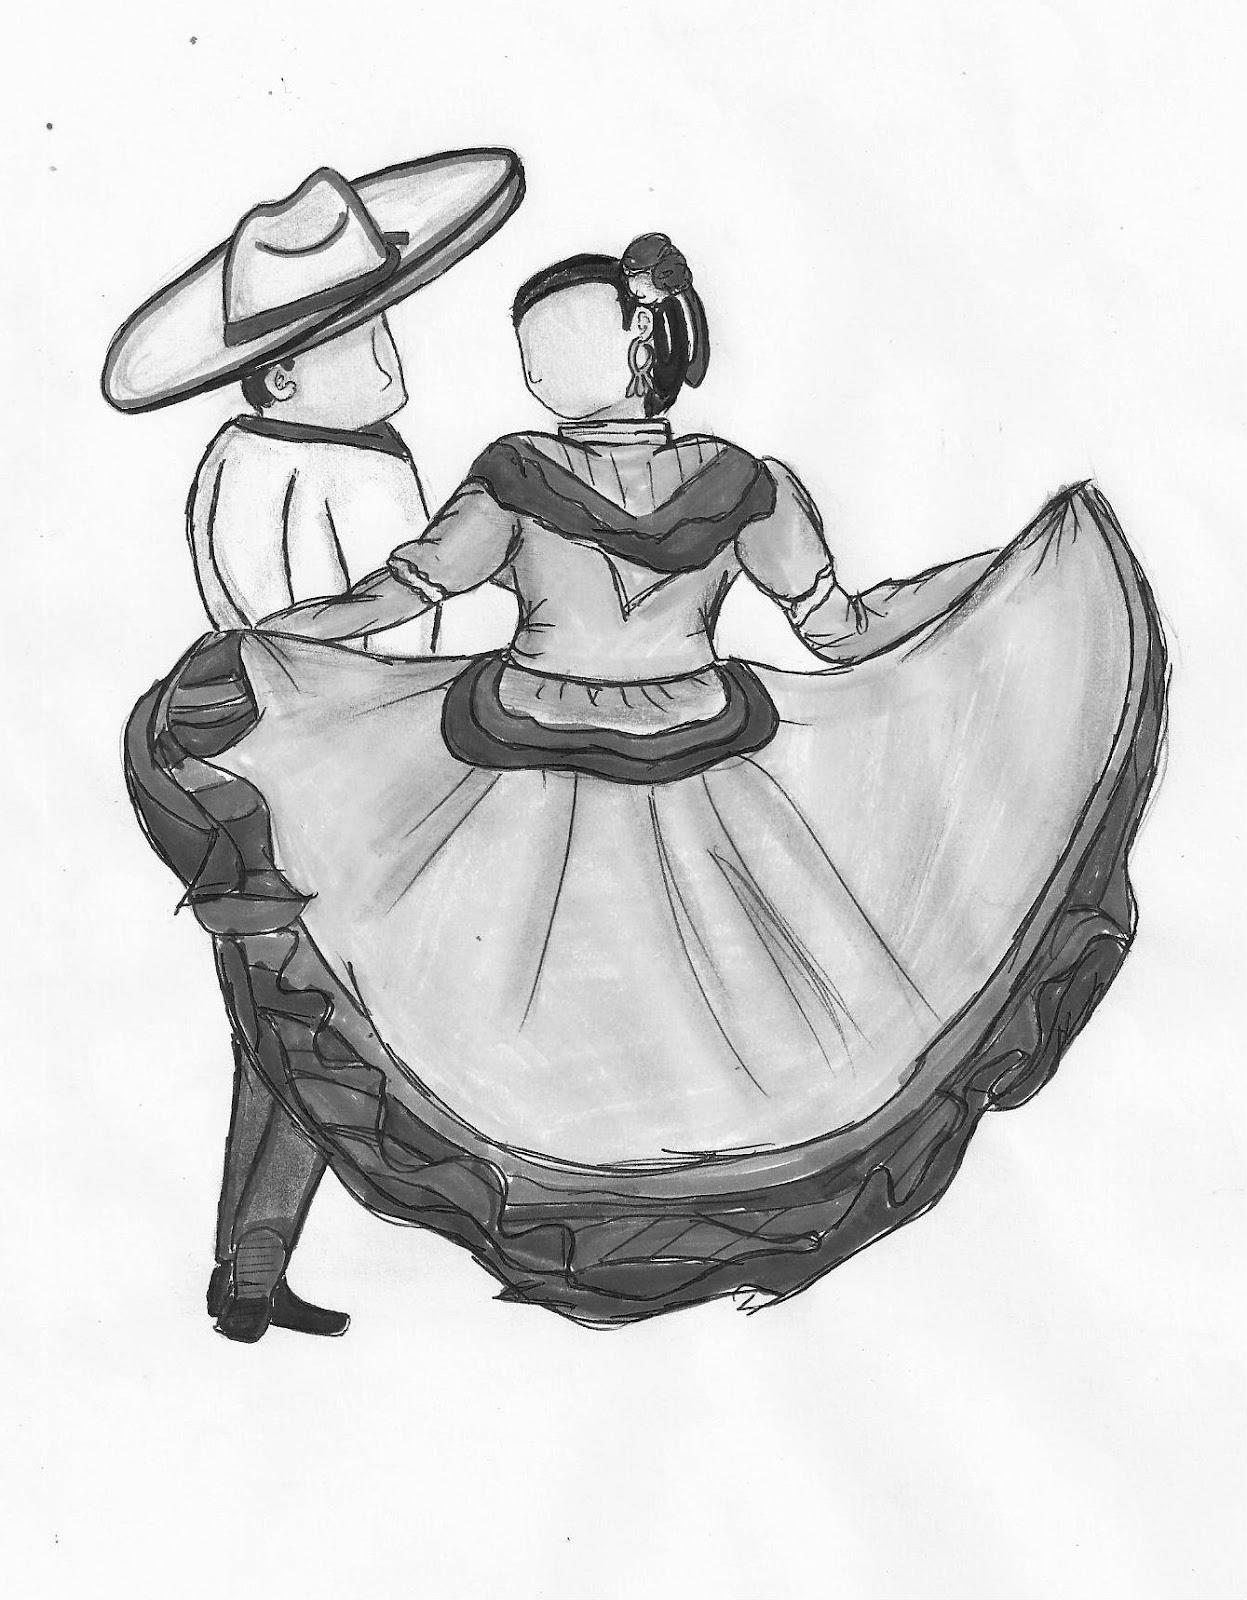 Asi me gusta bailar sobre una pija 5